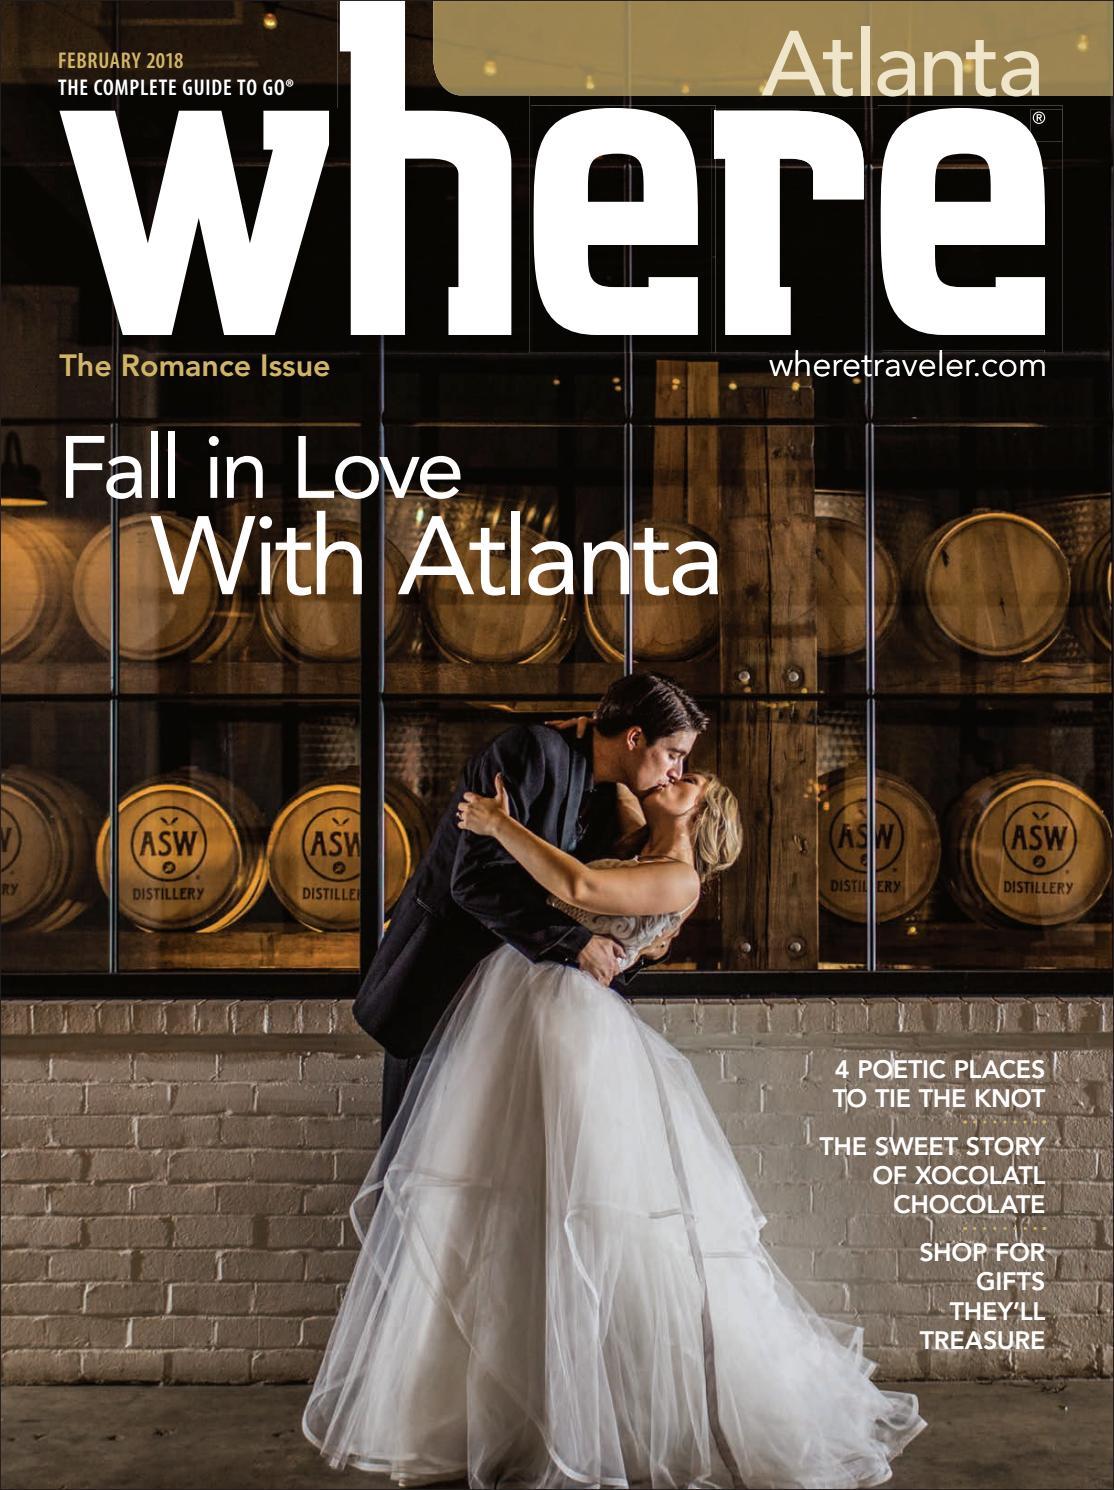 Where Magazine Atlanta Feb 2018 by Morris Media Network - issuu 816f05d7a9